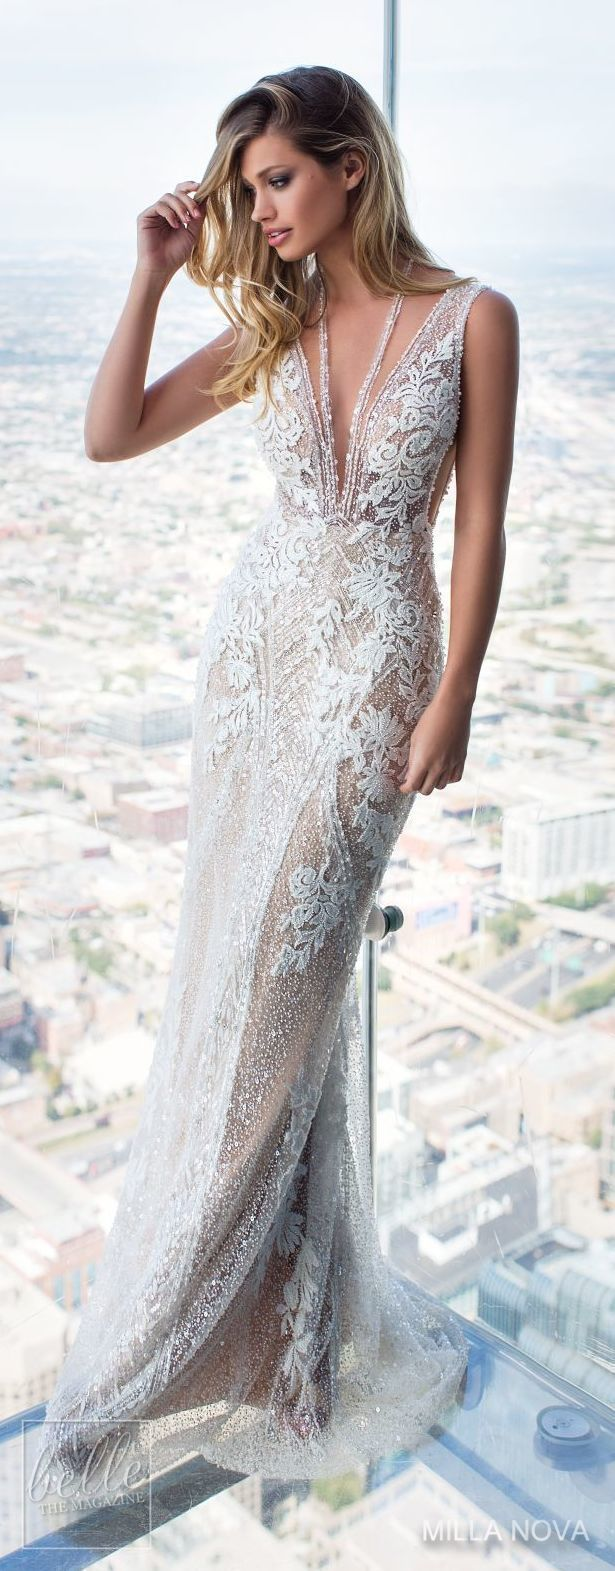 Milla nova wedding dresses collection clothes pinterest